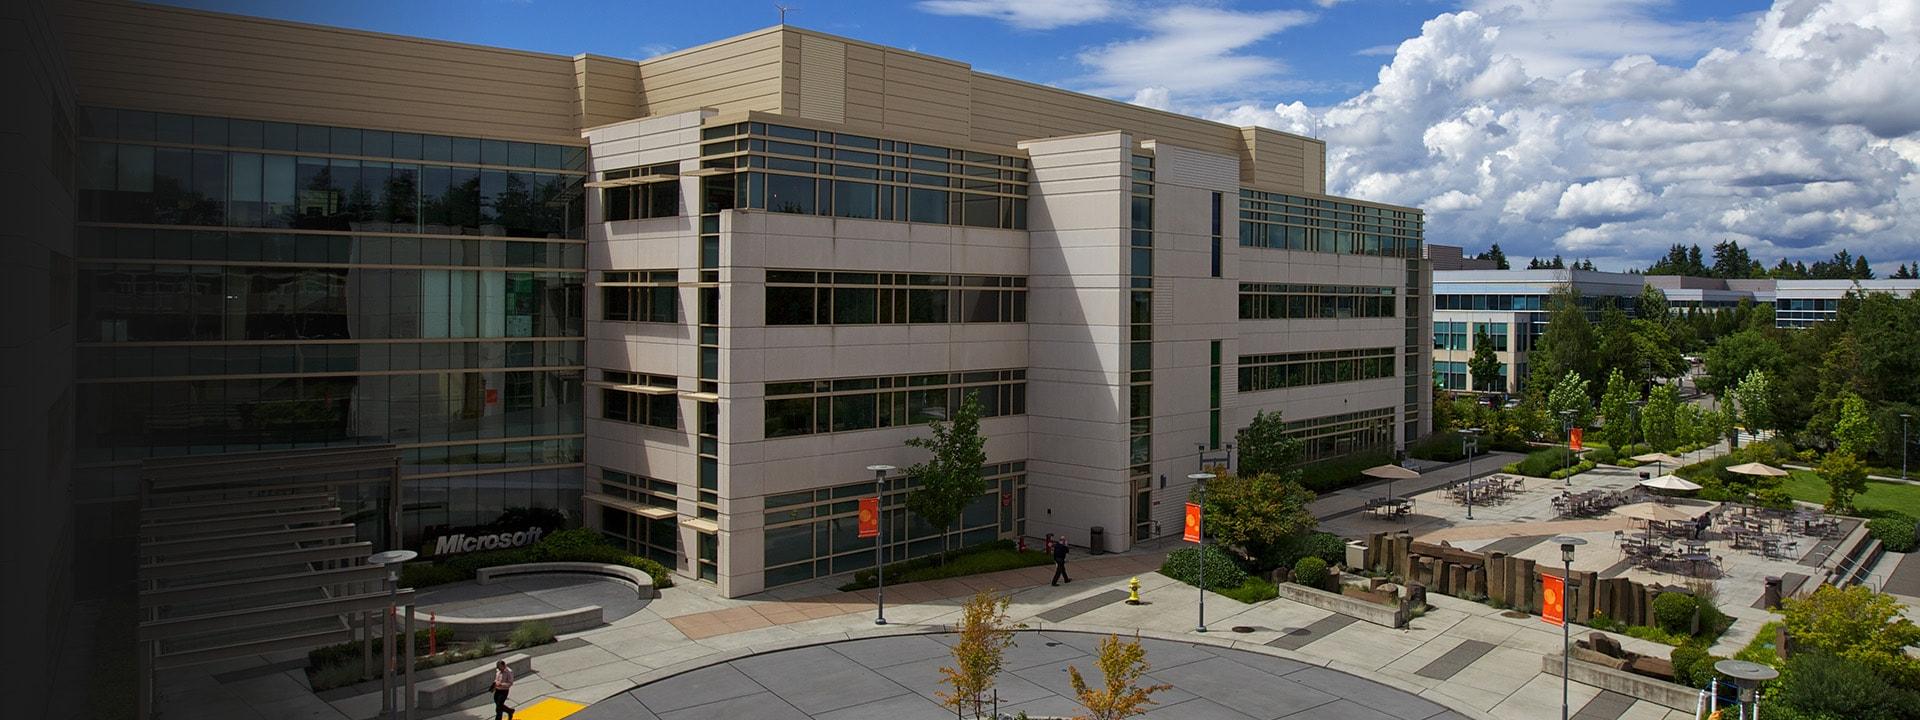 Building 92 microsoft store - Building 92 Microsoft Store 6